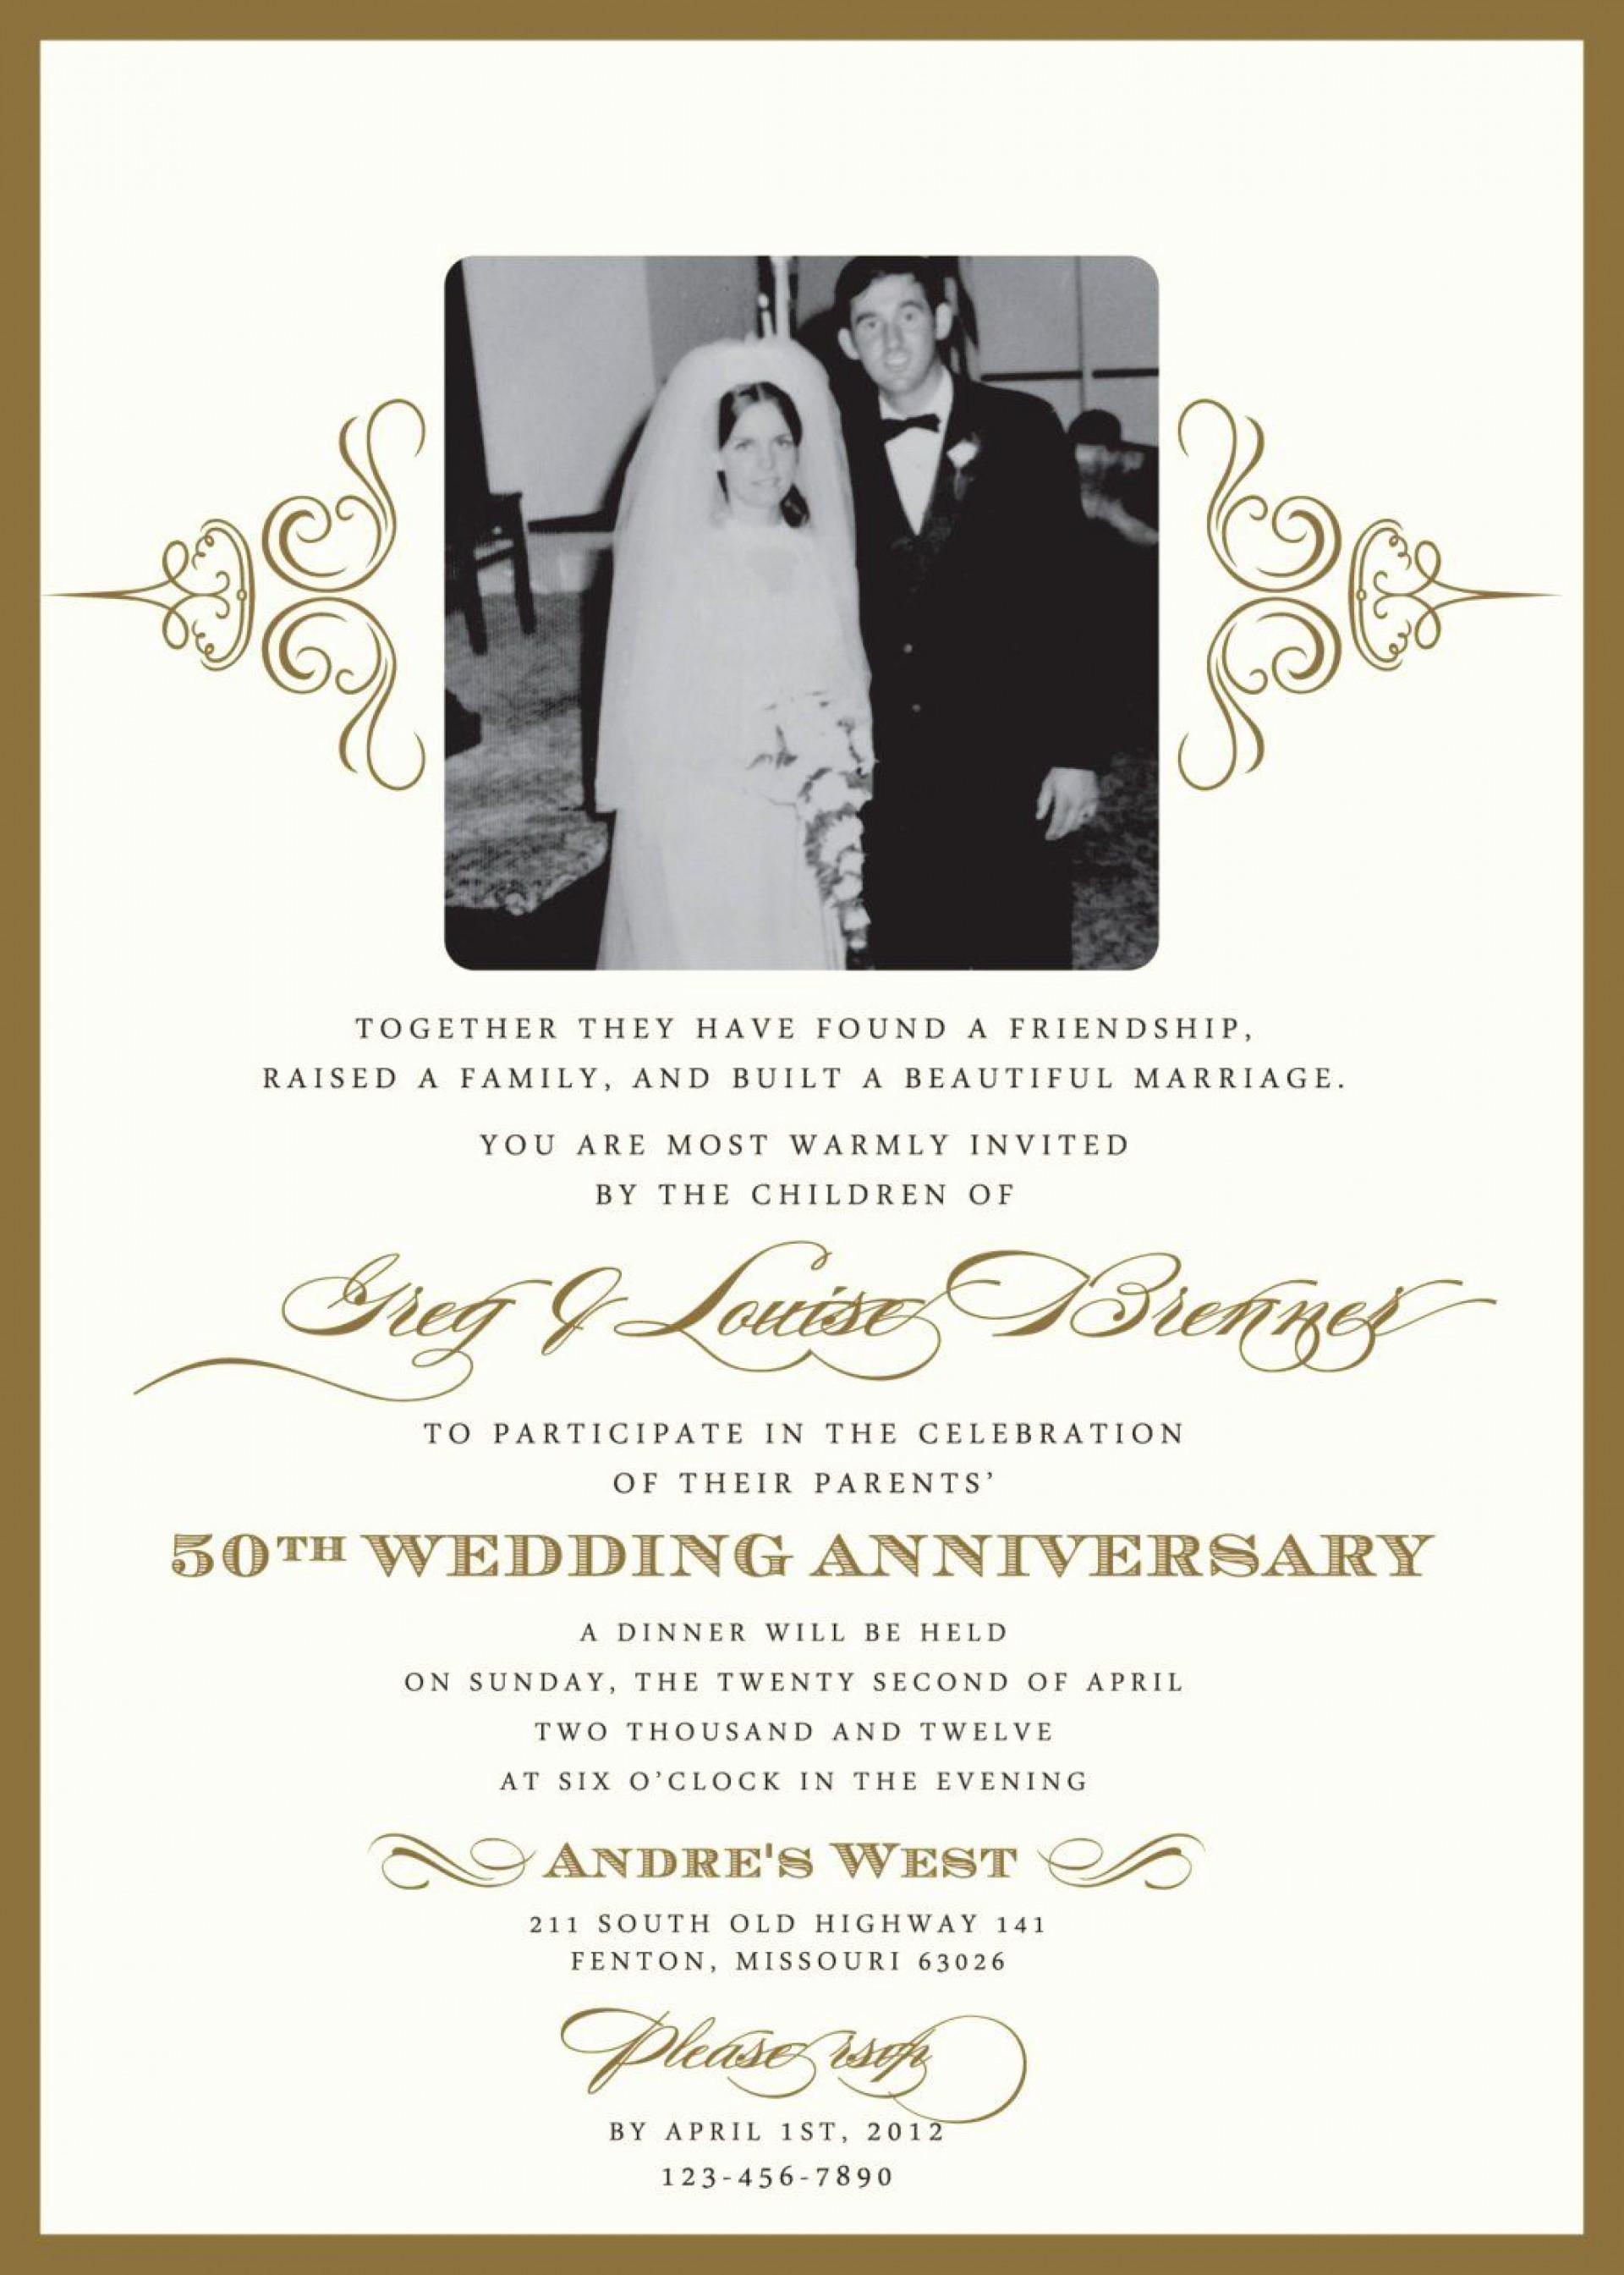 003 Amazing 50th Wedding Anniversary Party Invitation Template Inspiration  Templates Free1920